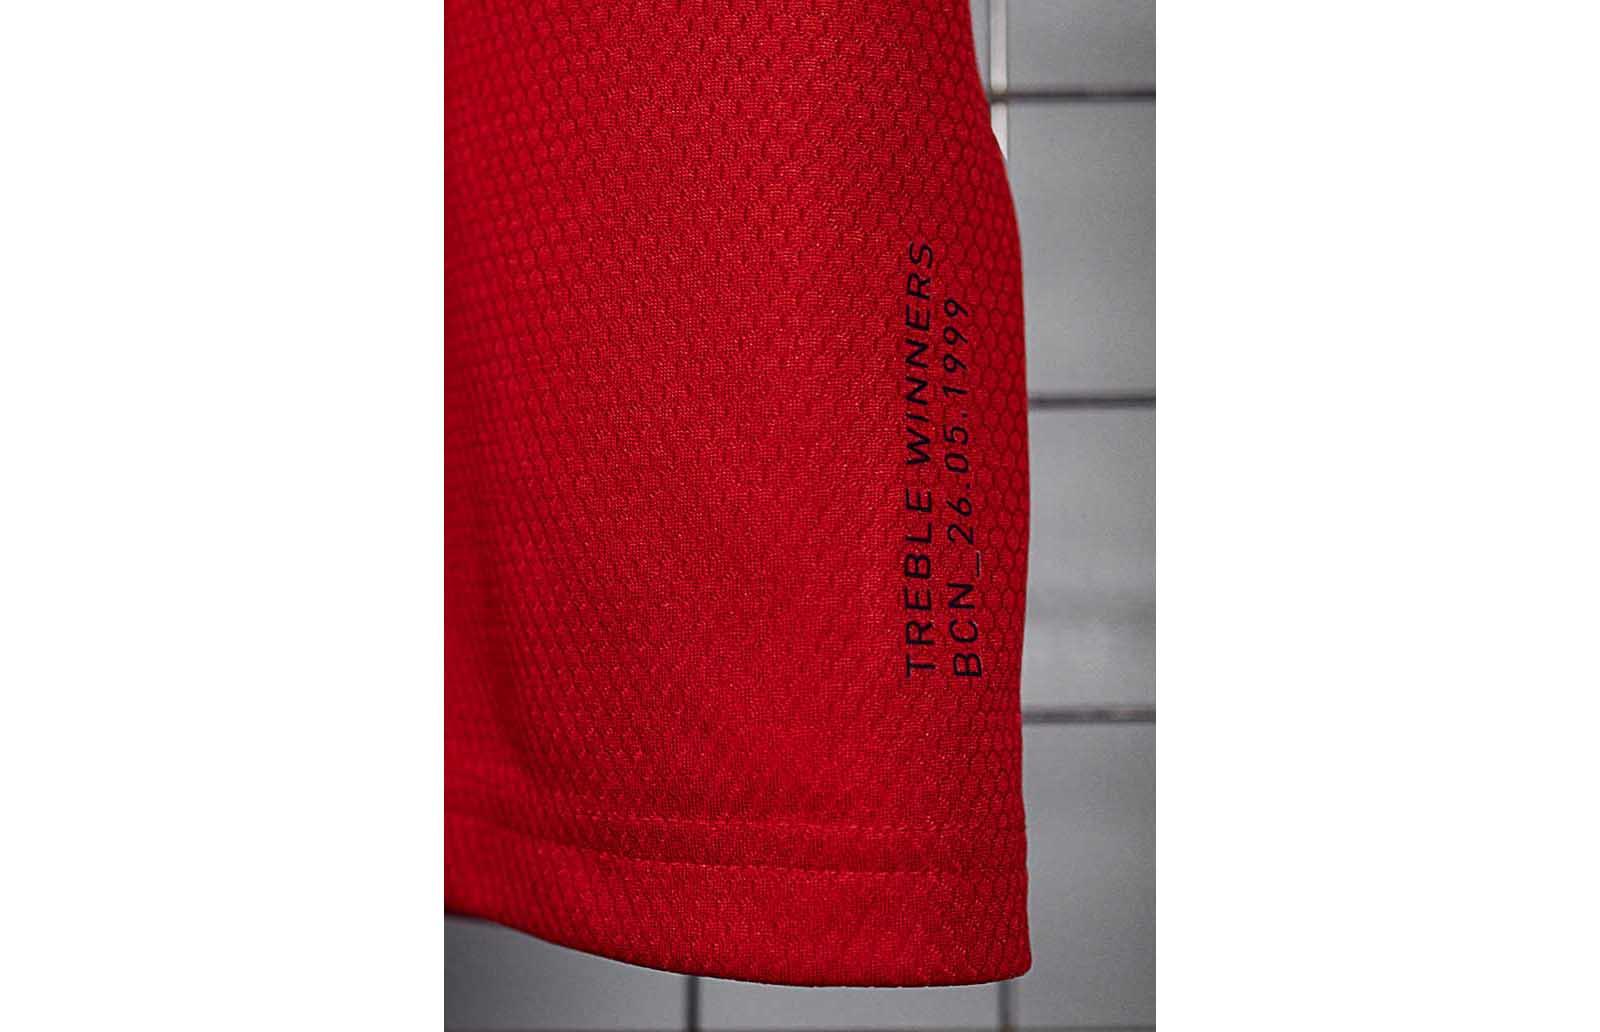 6-mufc-home-19-20-shirt